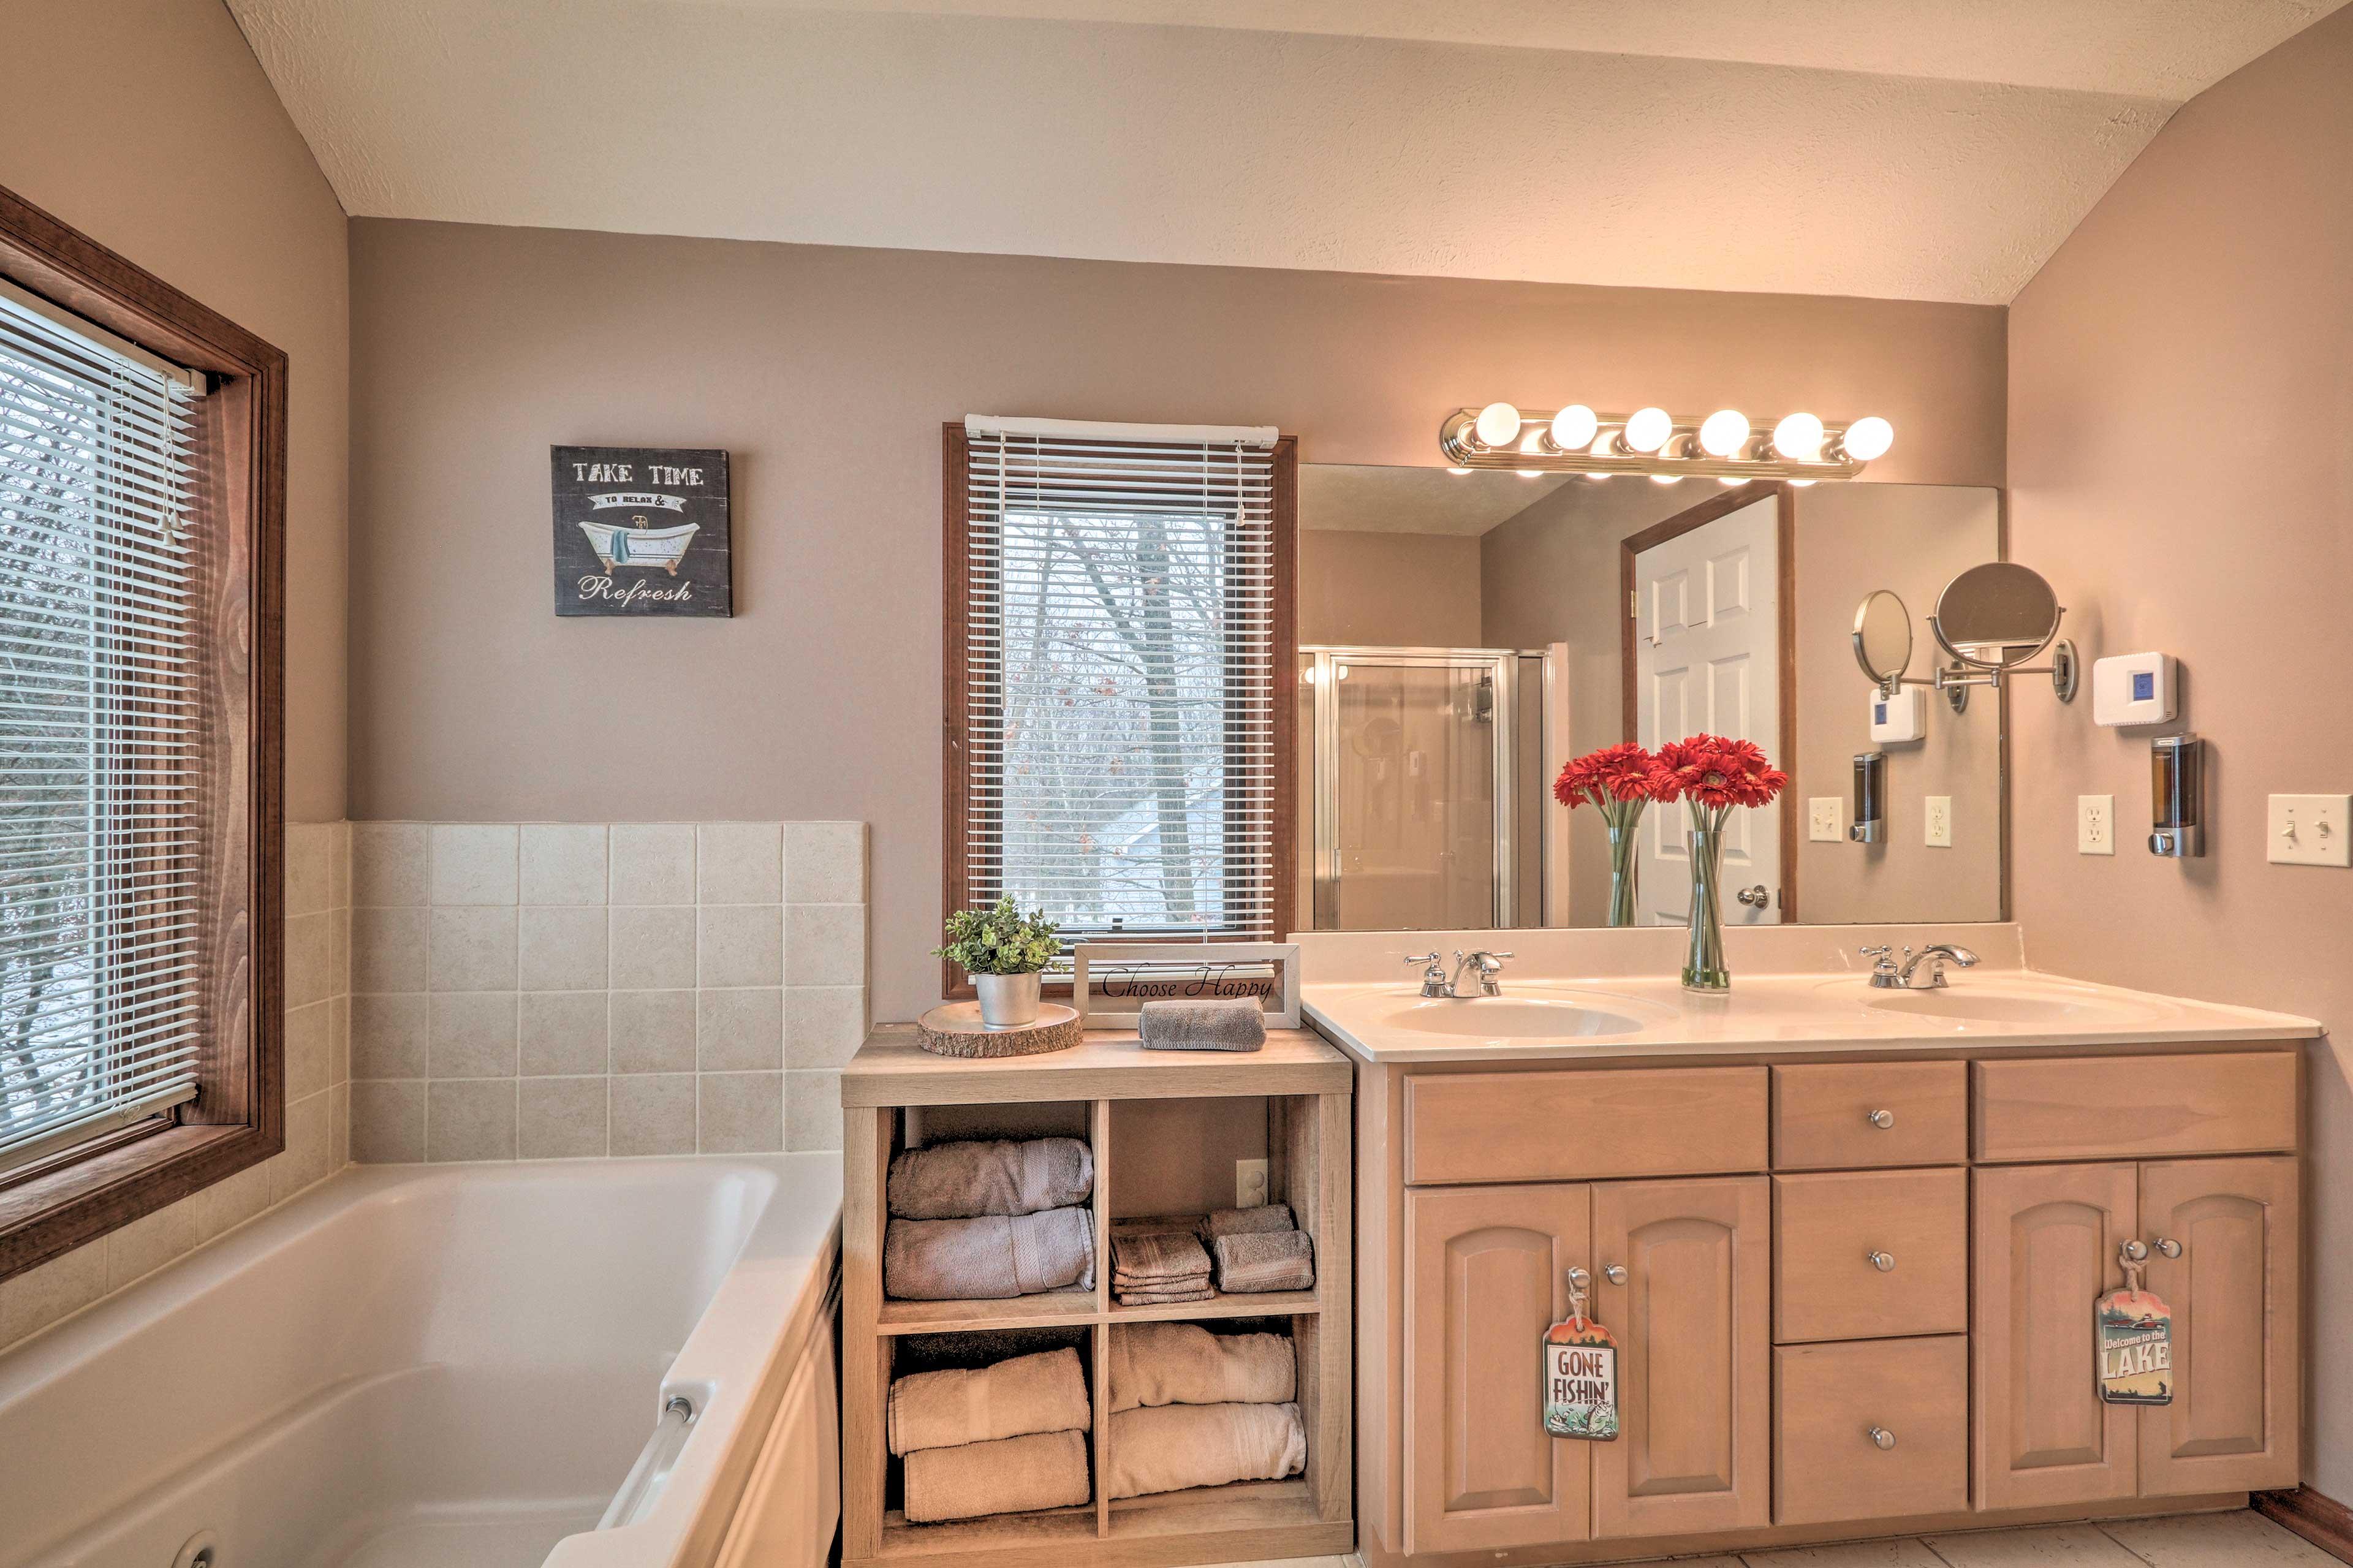 Master Bedroom   En-Suite Bathroom   Jetted Tub   Towels Provided